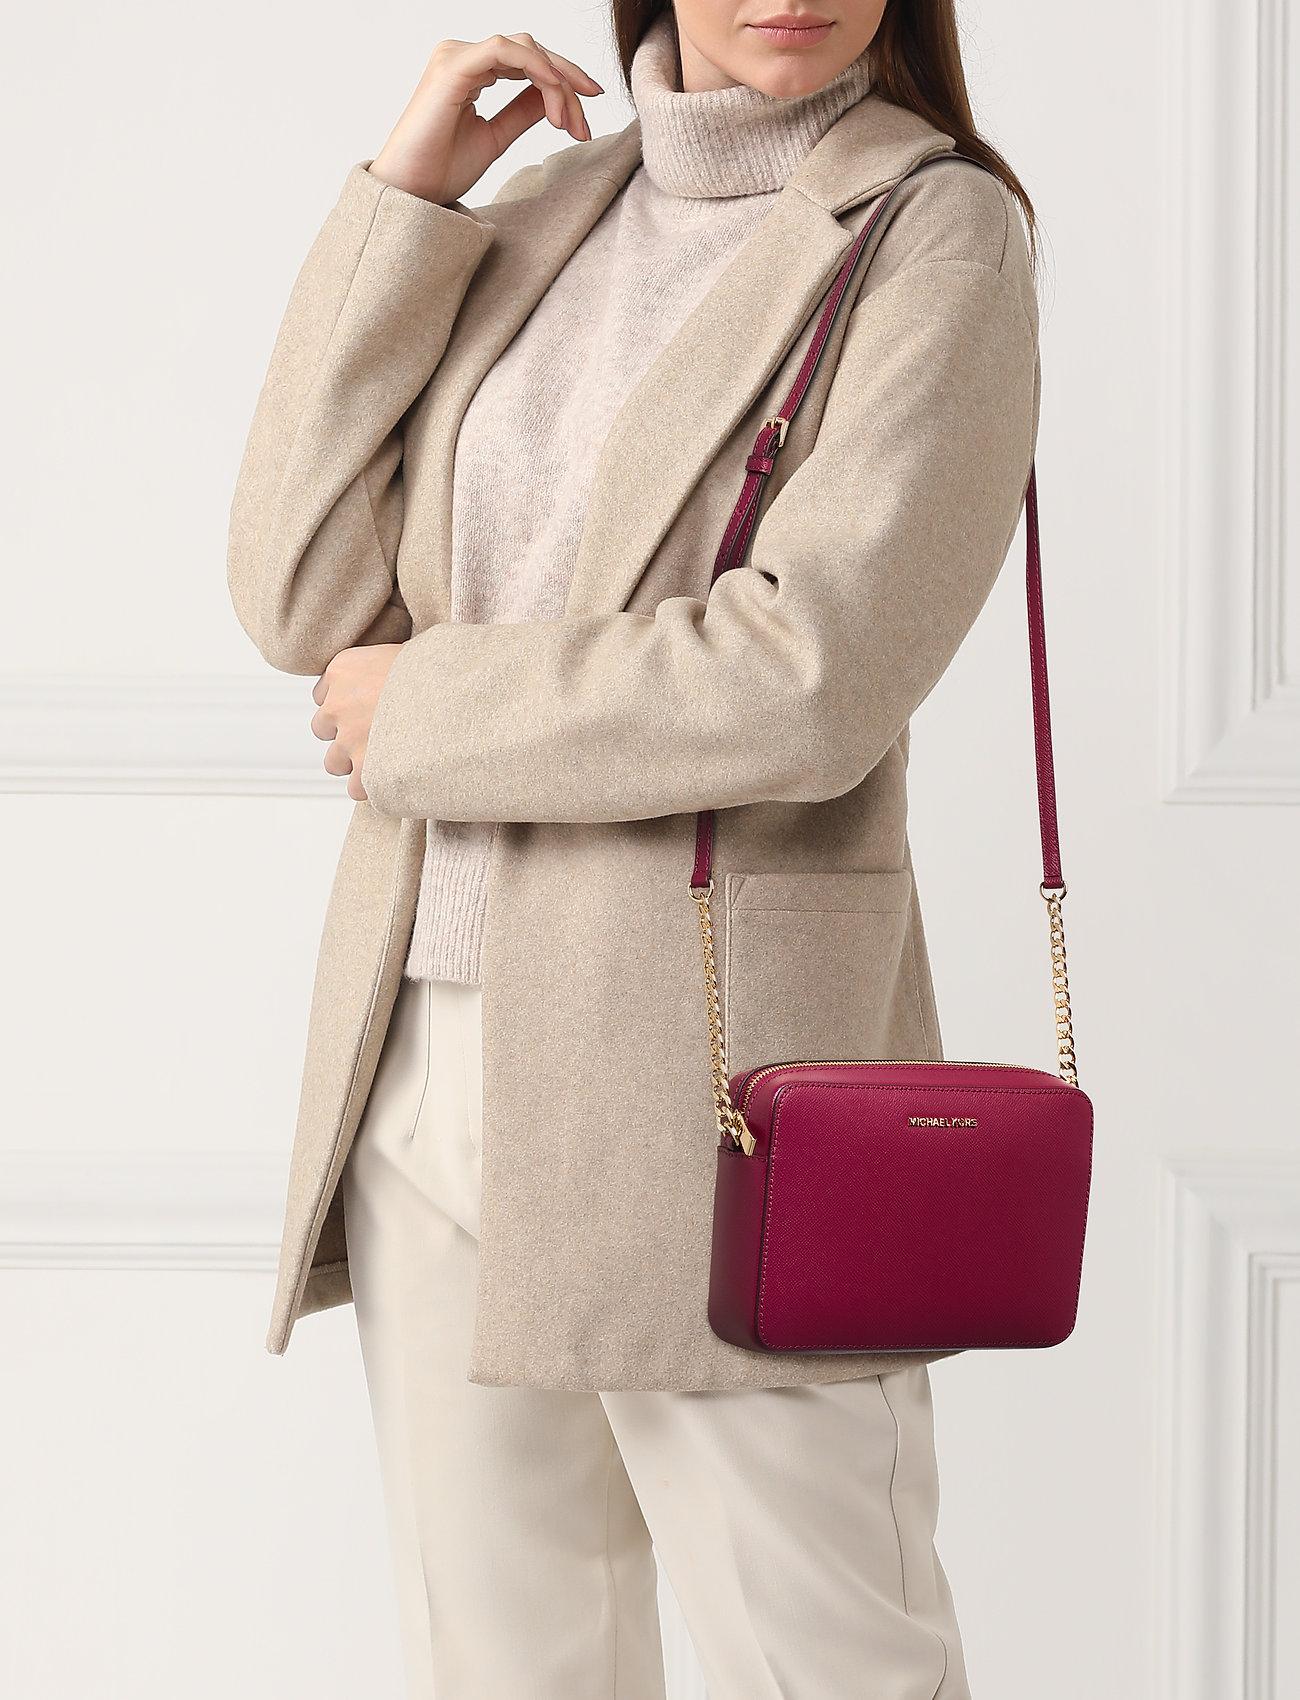 Michael Kors Bags LG EW CROSSBODY - BERRY